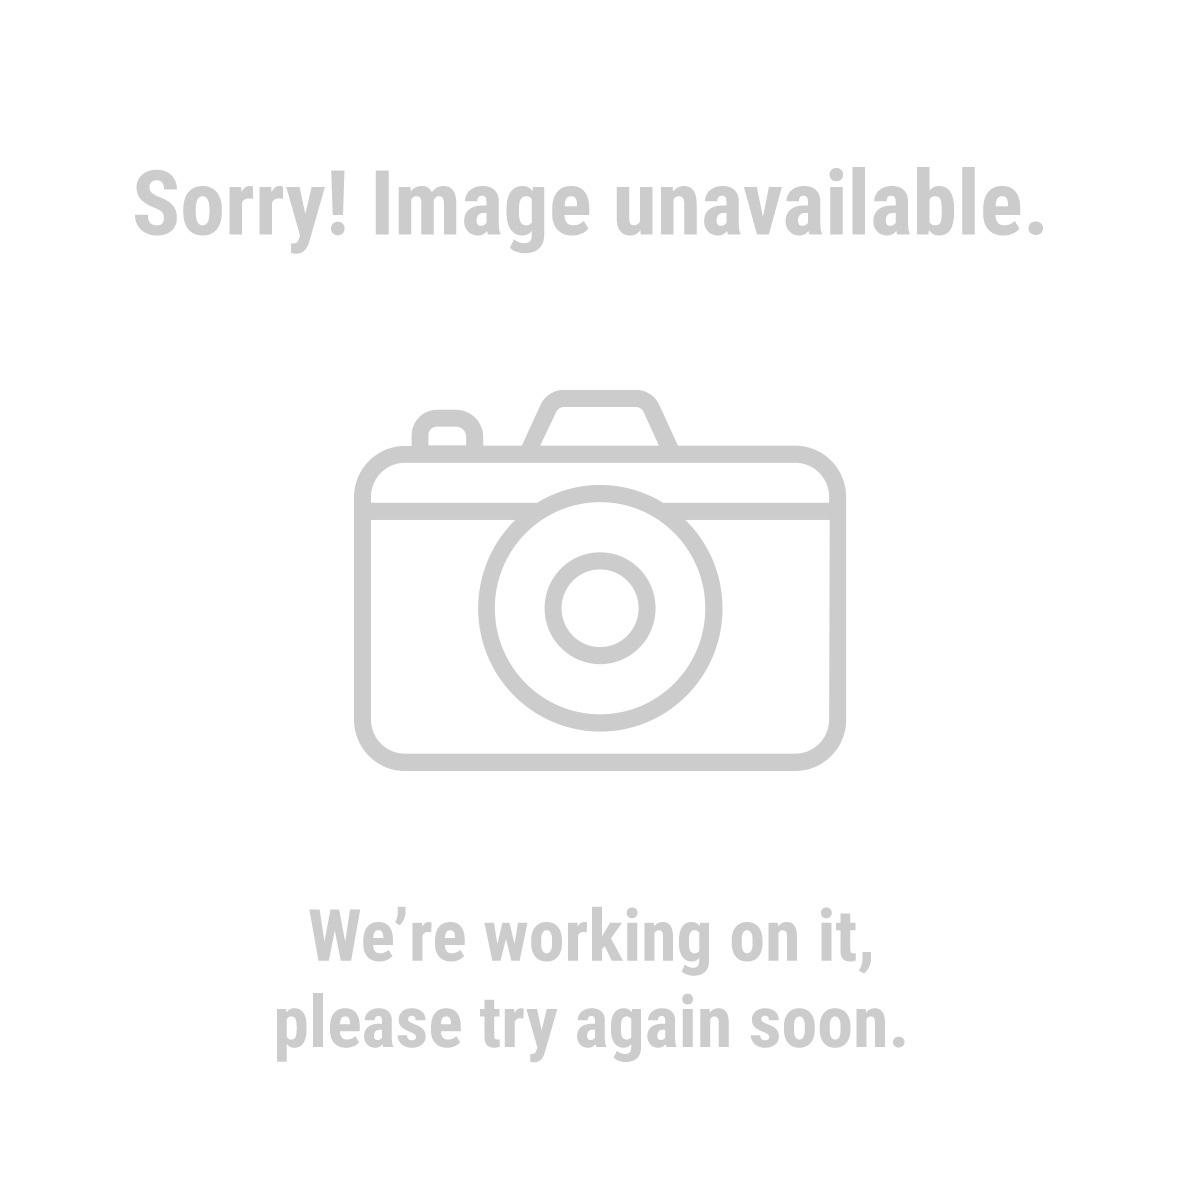 Central Pneumatic 94605 Pneumatic Paint Shaker